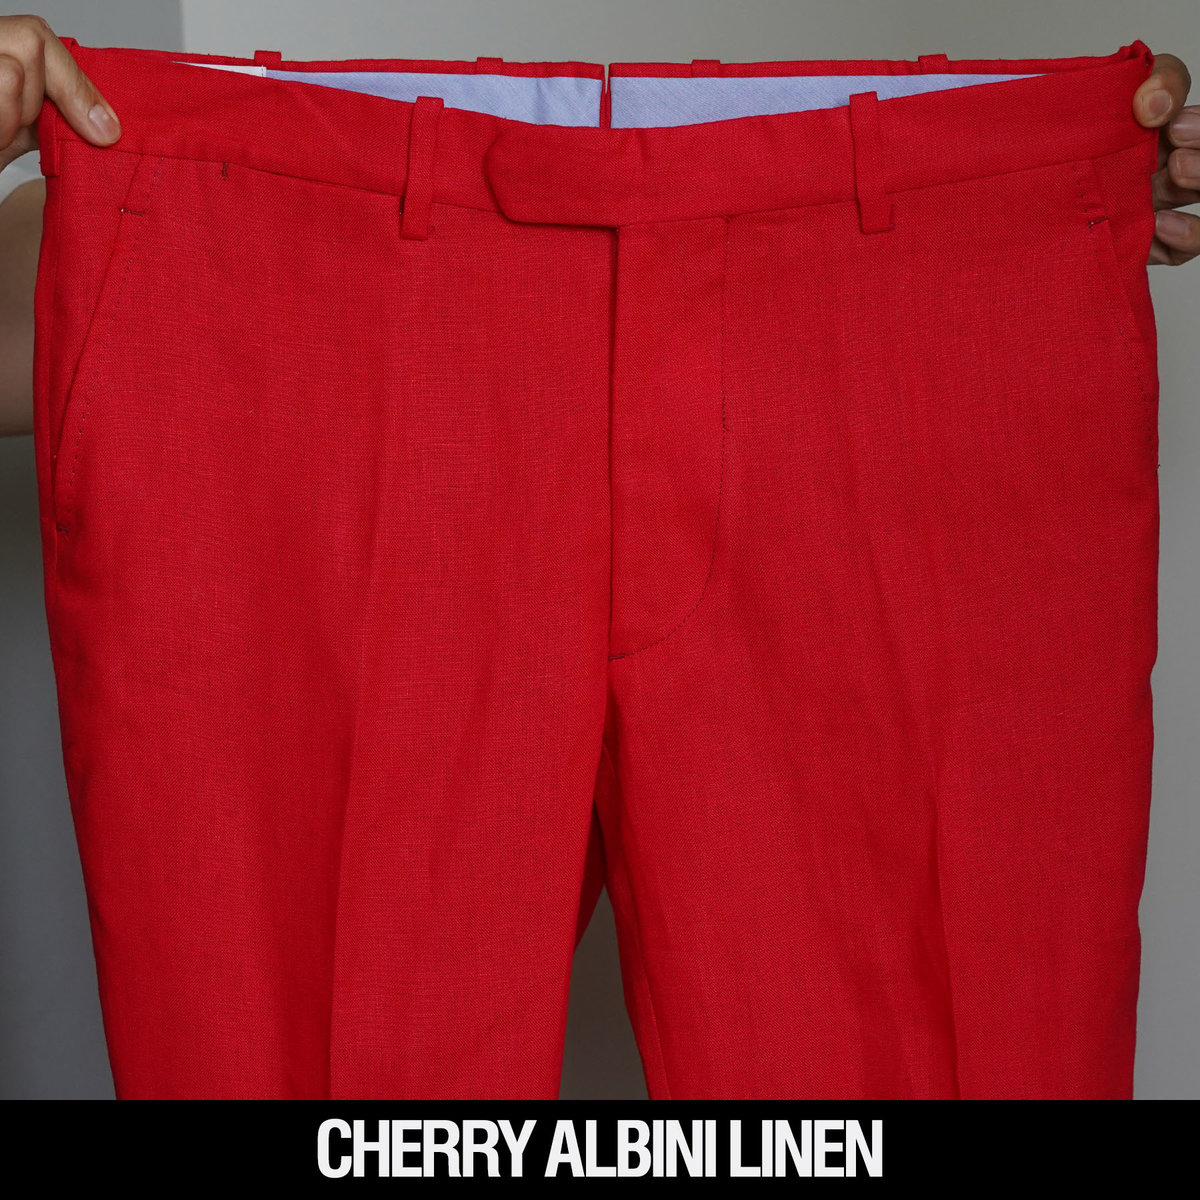 Cherry Albini Linen.jpg